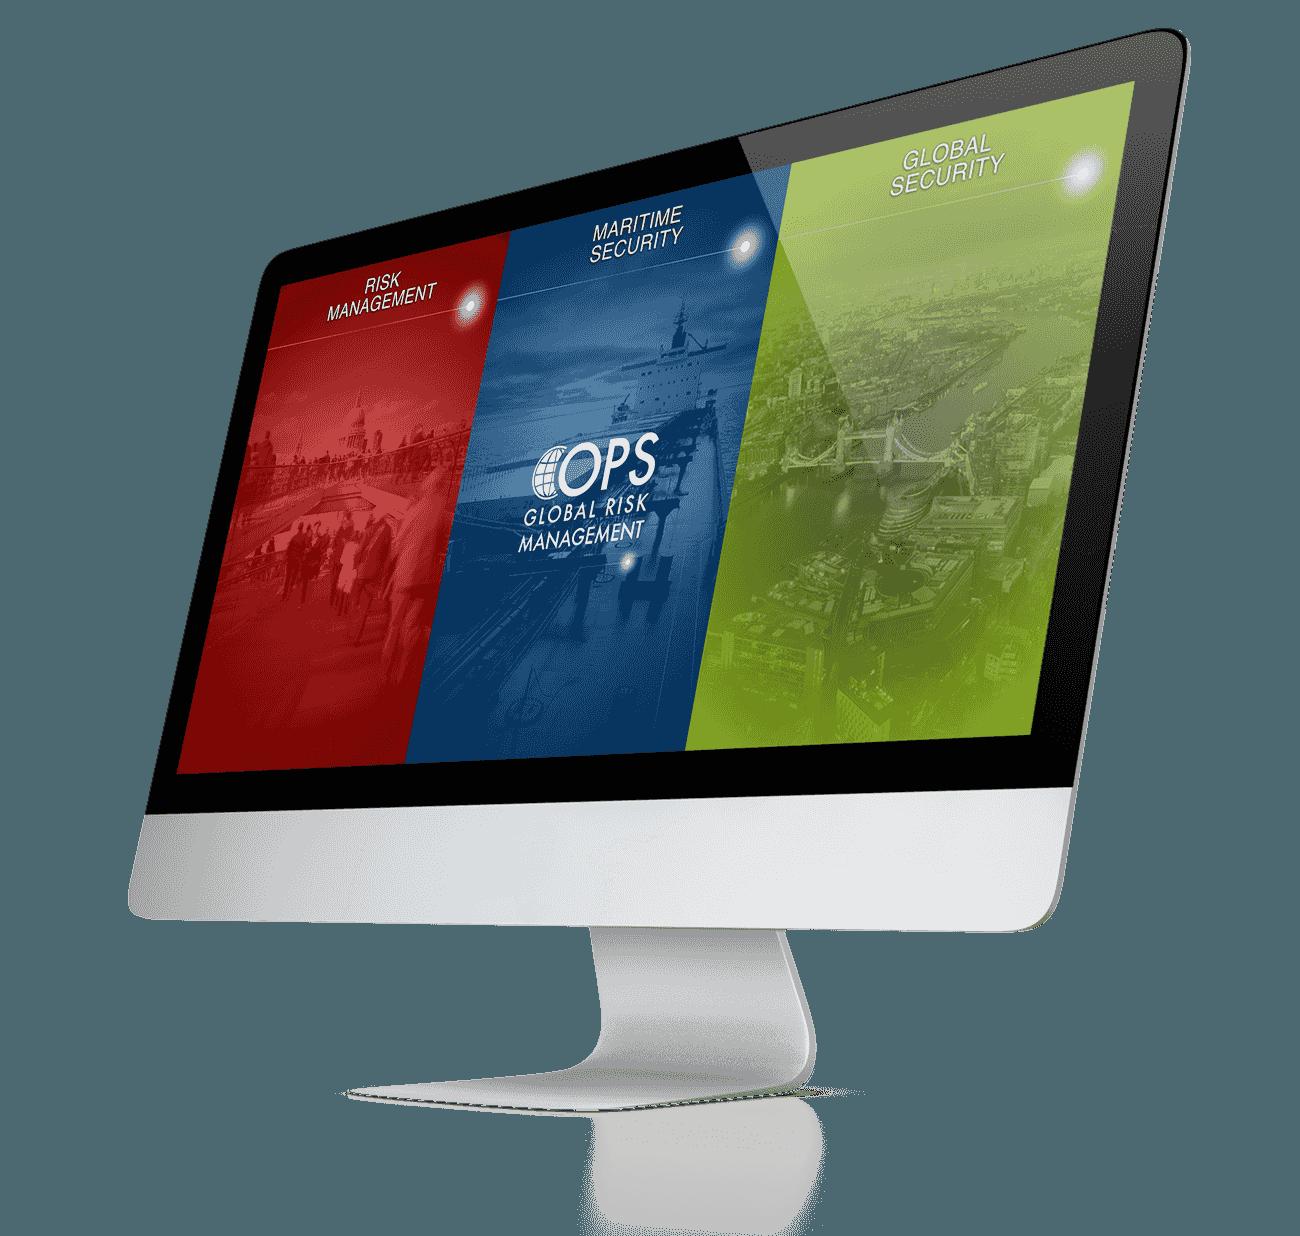 Rental Apartment Websites: Website Design & Web Design